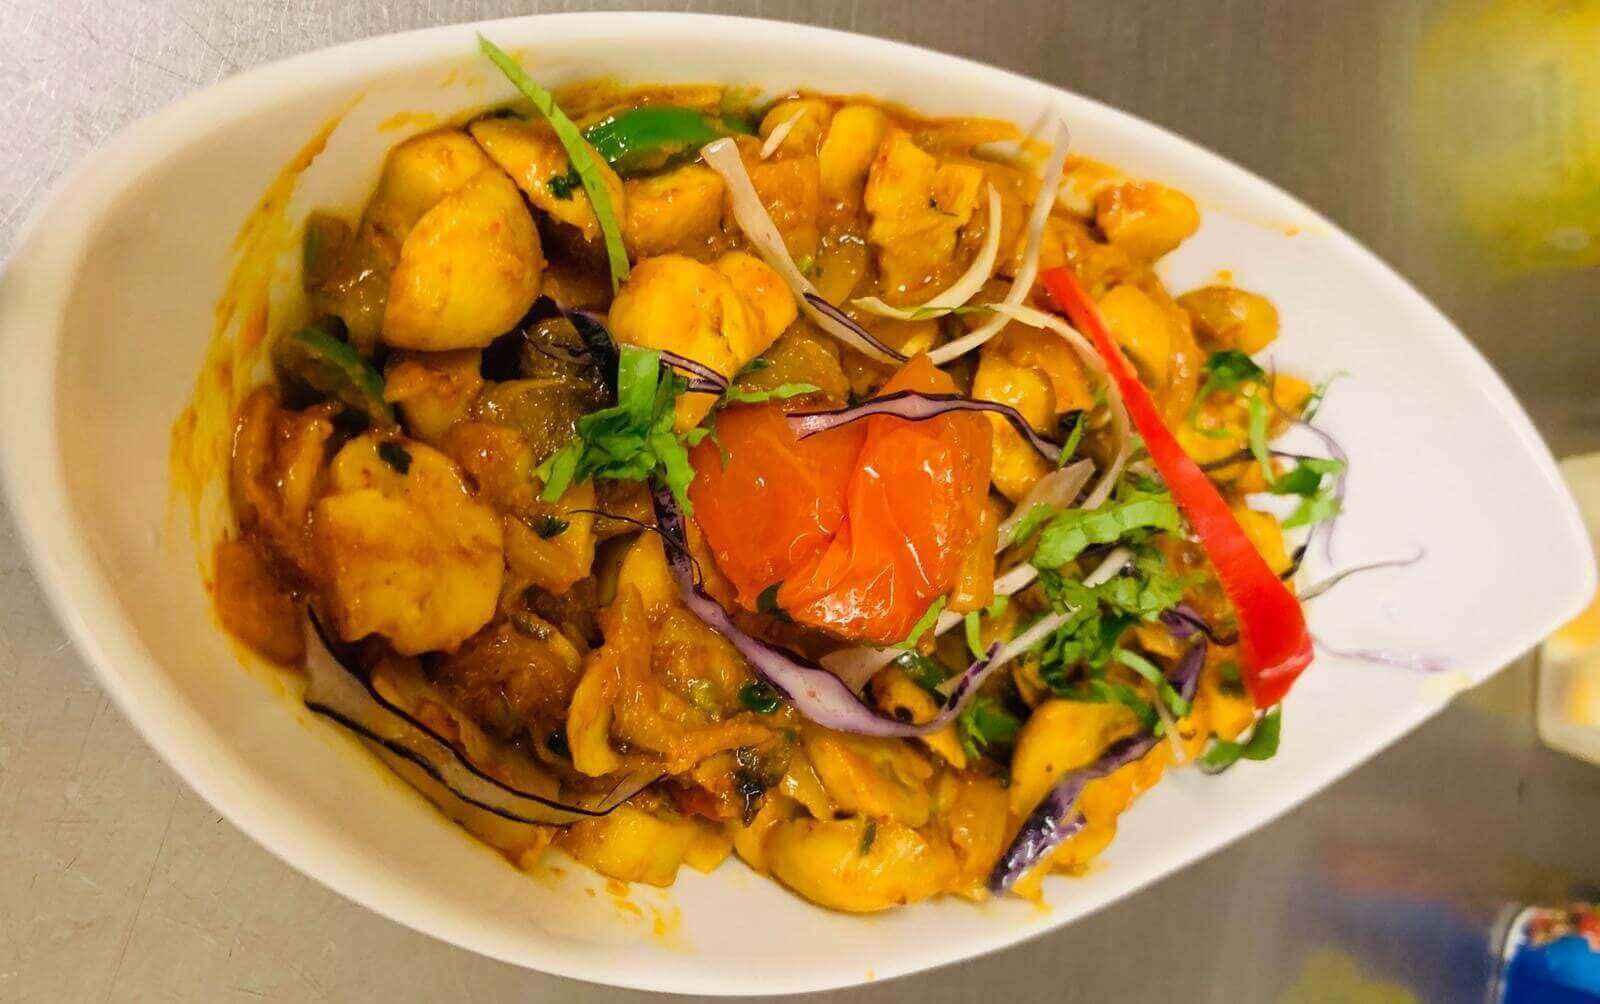 36. Indian food at khans restaurant battersea sw11